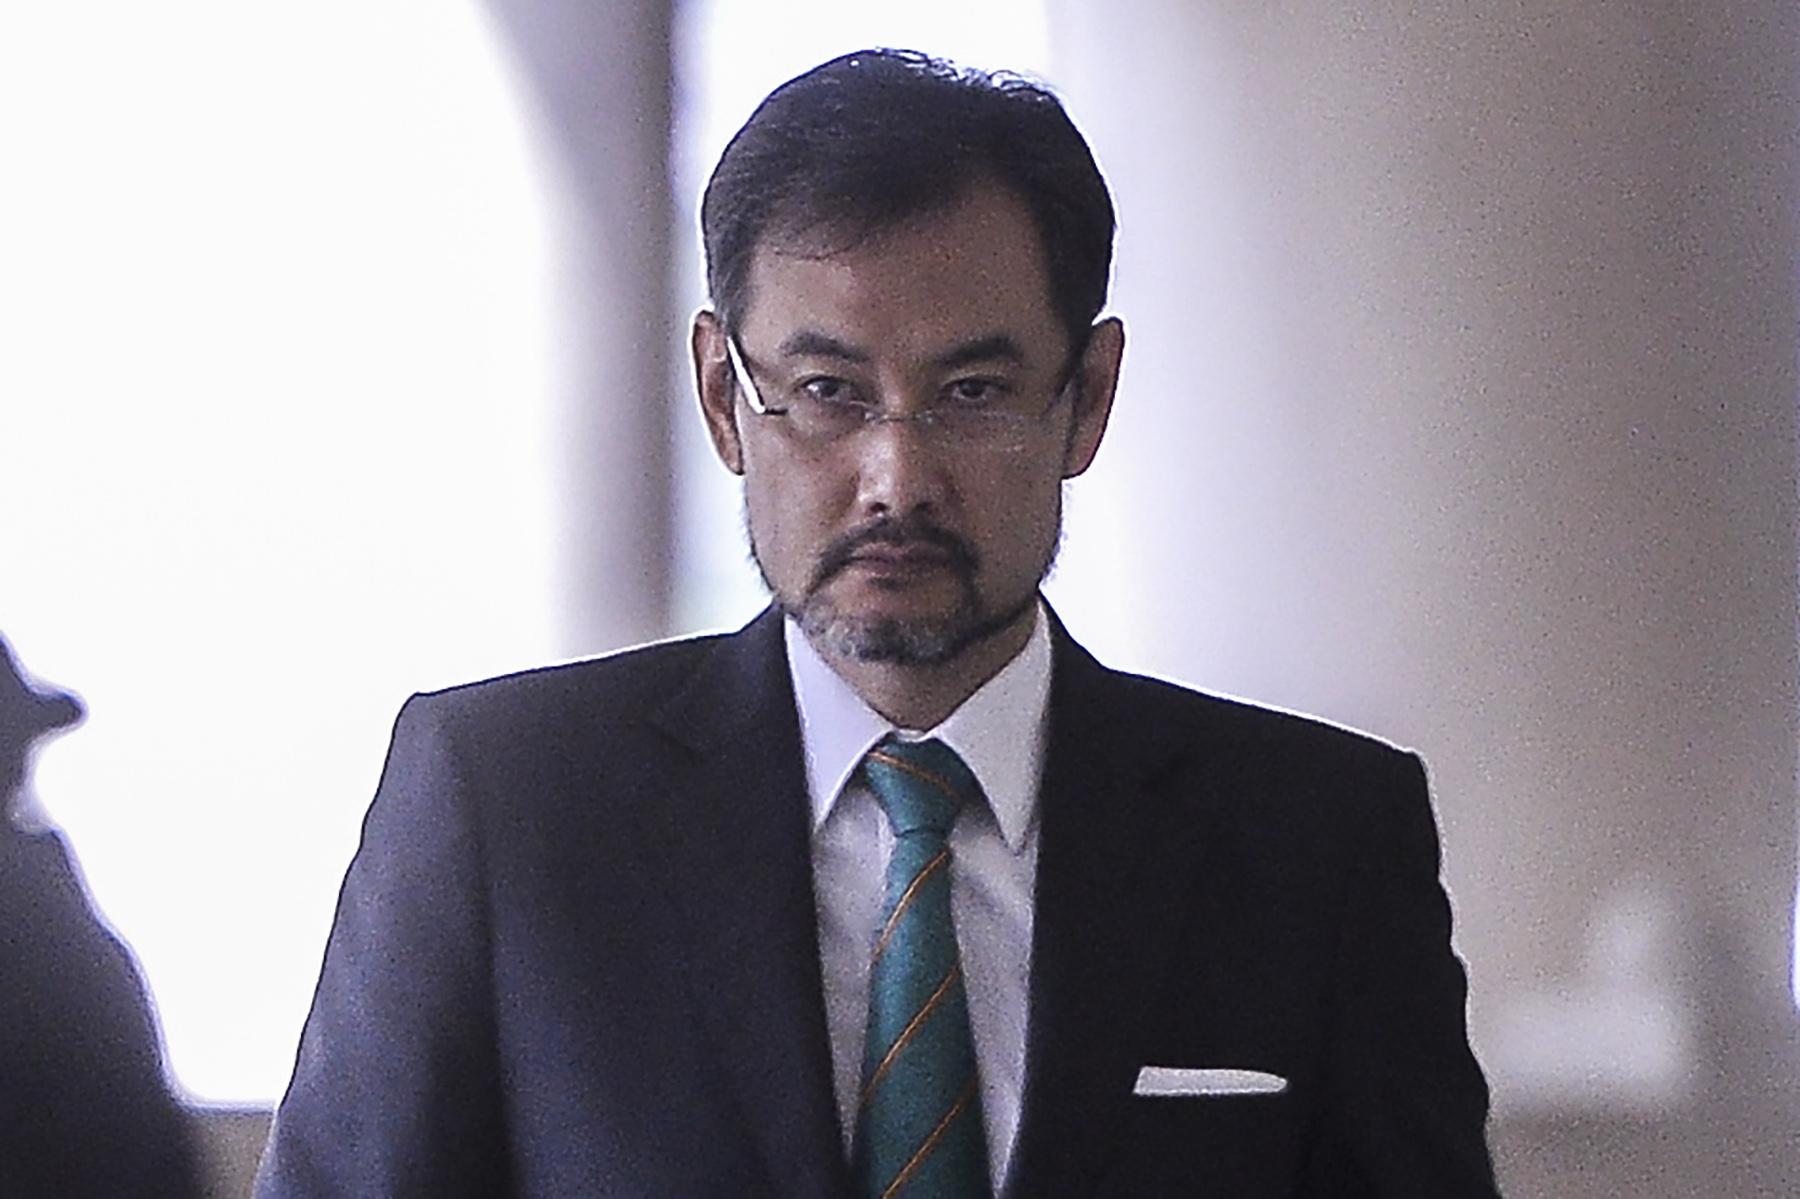 Former 1MDB CEO Datuk Shahrol Azral Ibrahim Halmi at the Kuala Lumpur High Court November 6, 2019. — Picture by Miera Zulyana